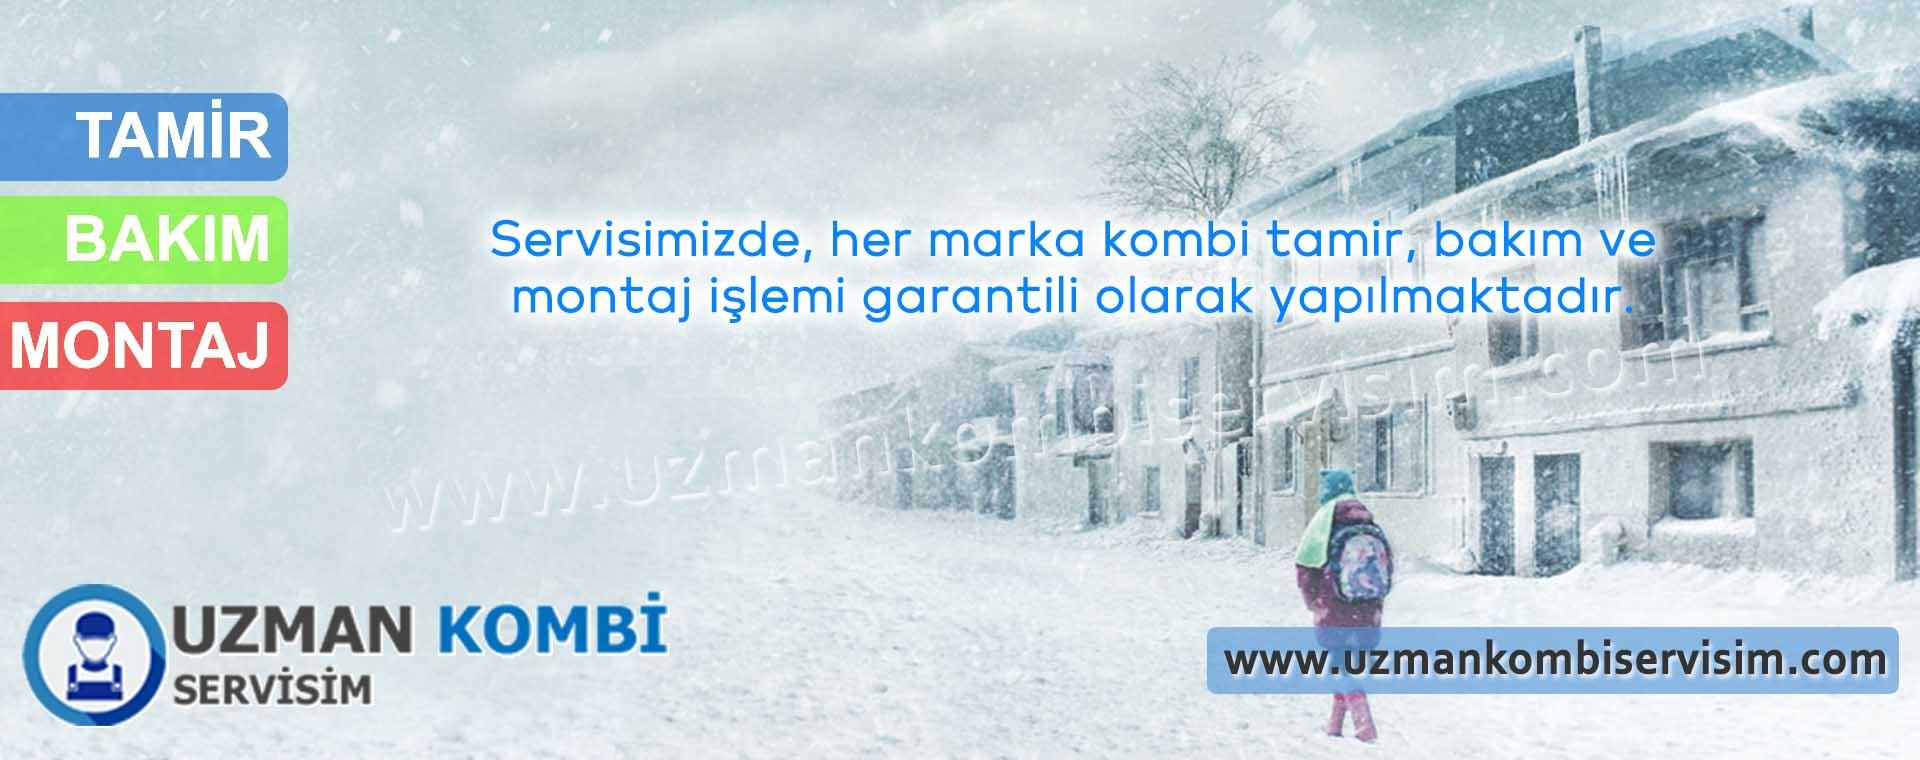 Yenimahalle Kombi Servisi Ankara, Yenimahalle Uzman Kombi bakımı, kombi montajı, petek temizleme, kart tamiri, Yenimahalle 7/24 garantili kombi teknik servisi.